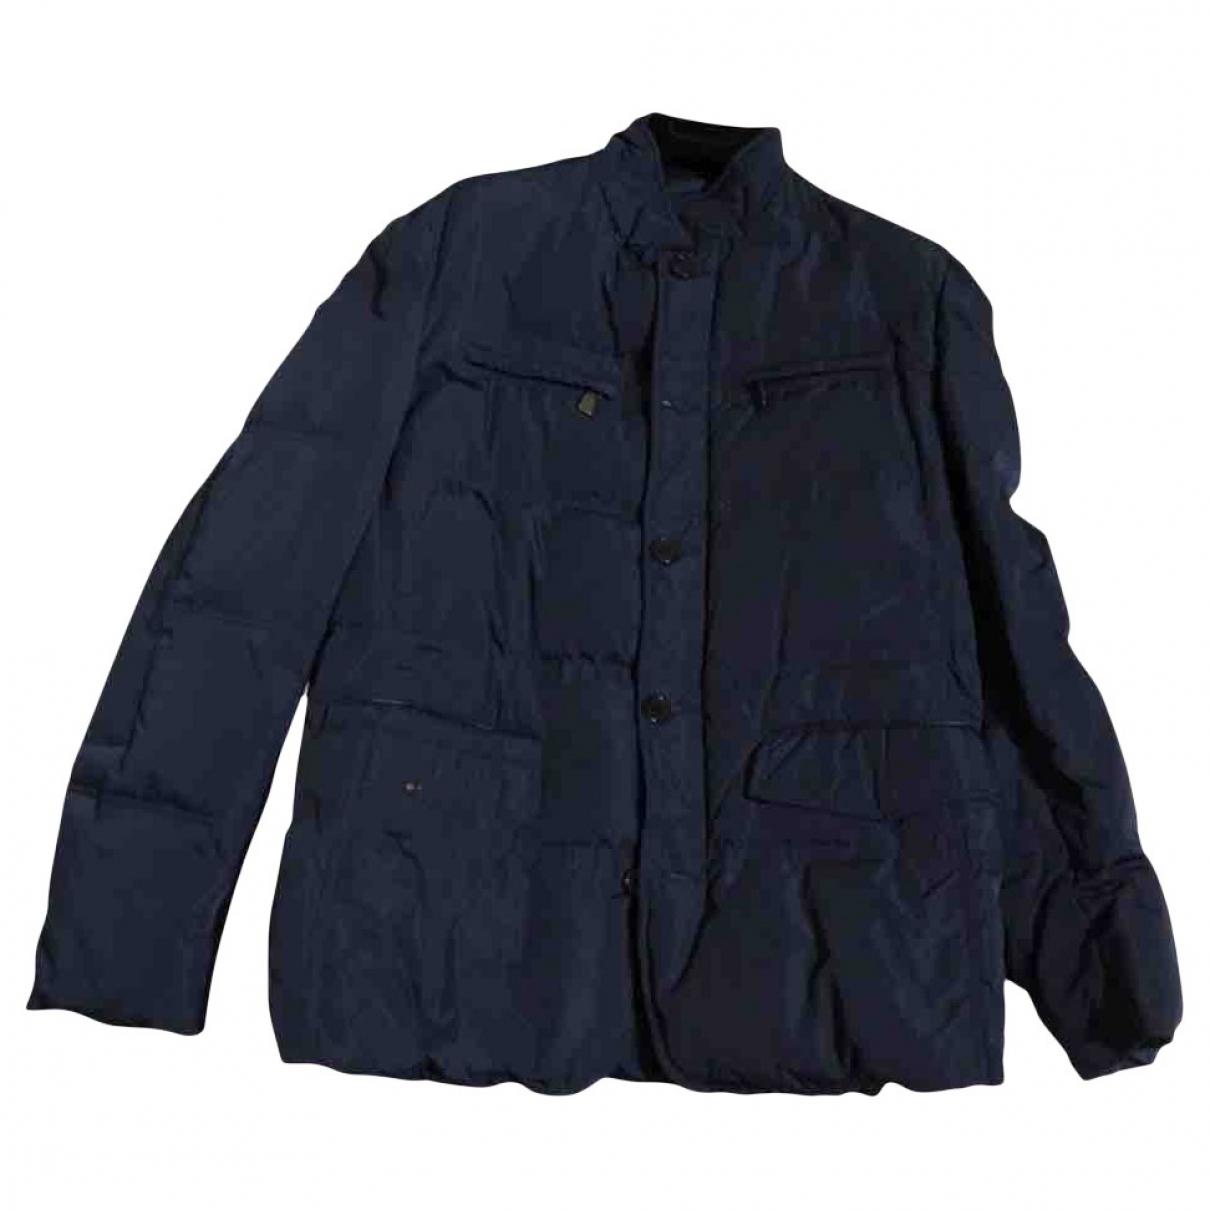 Trussardi Jeans \N Jacke Blau